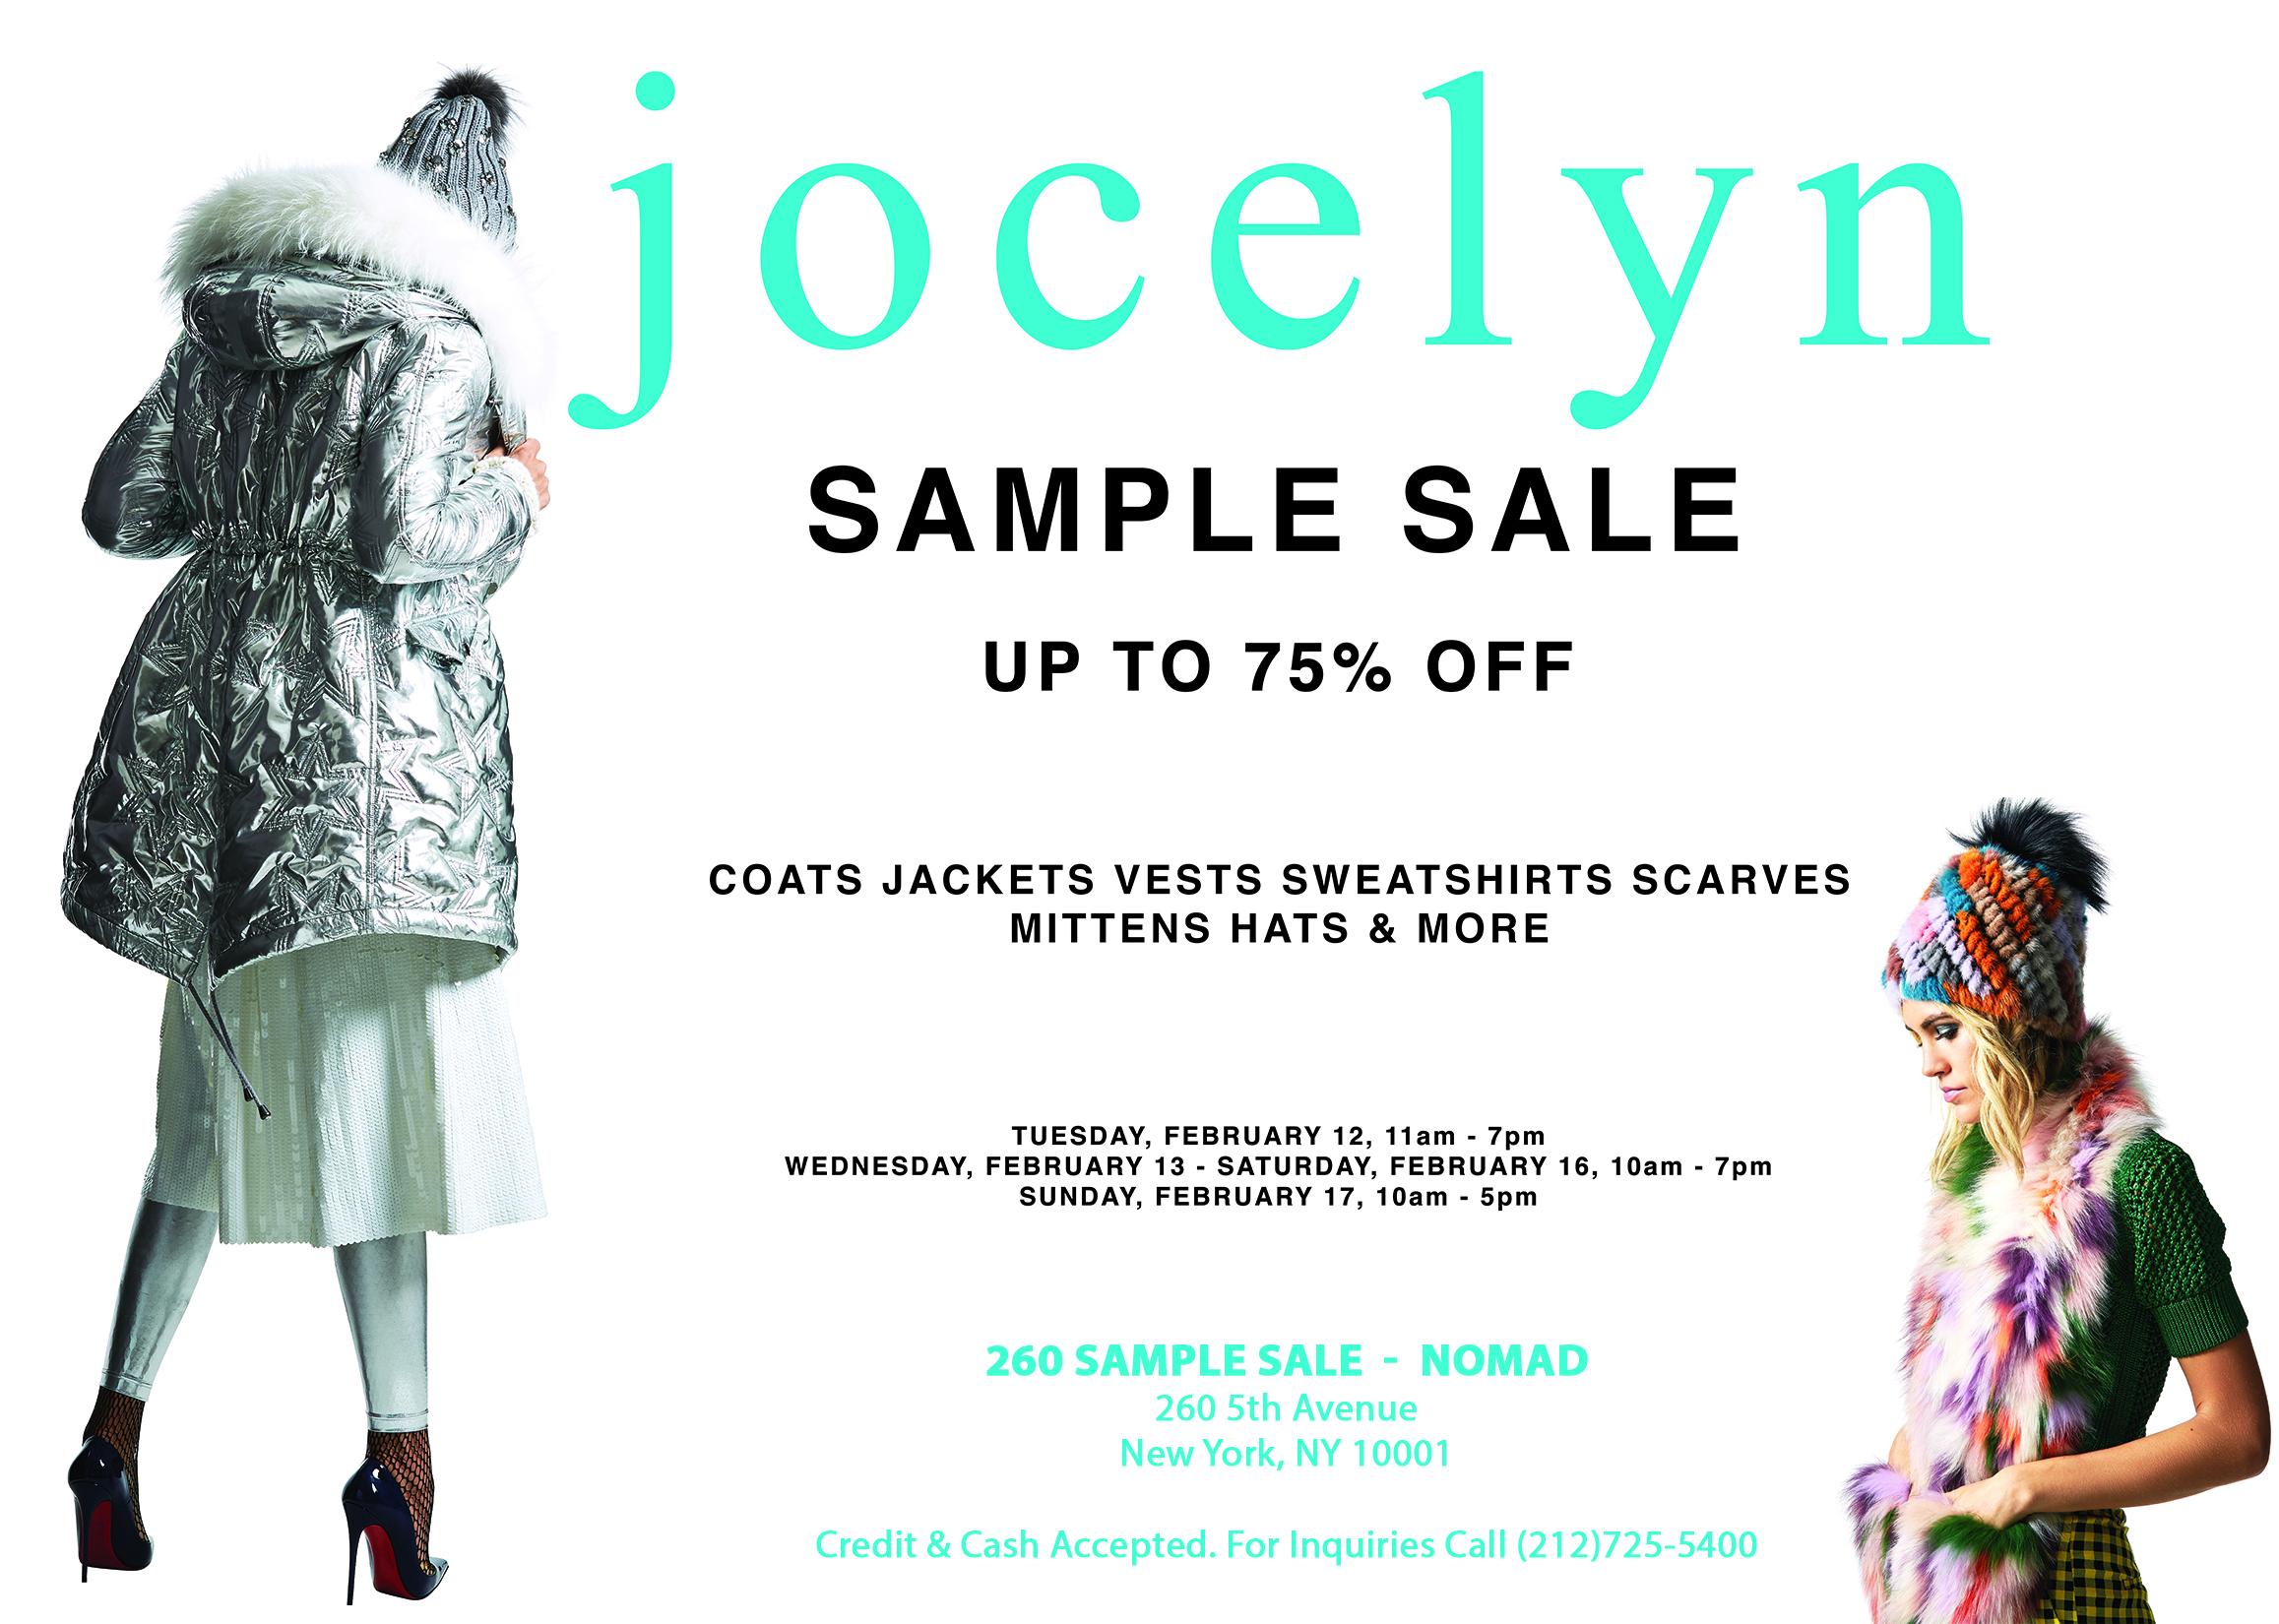 Jocelyn Sample Sale   GPFlyer.jpg cc0dc687bfe5a